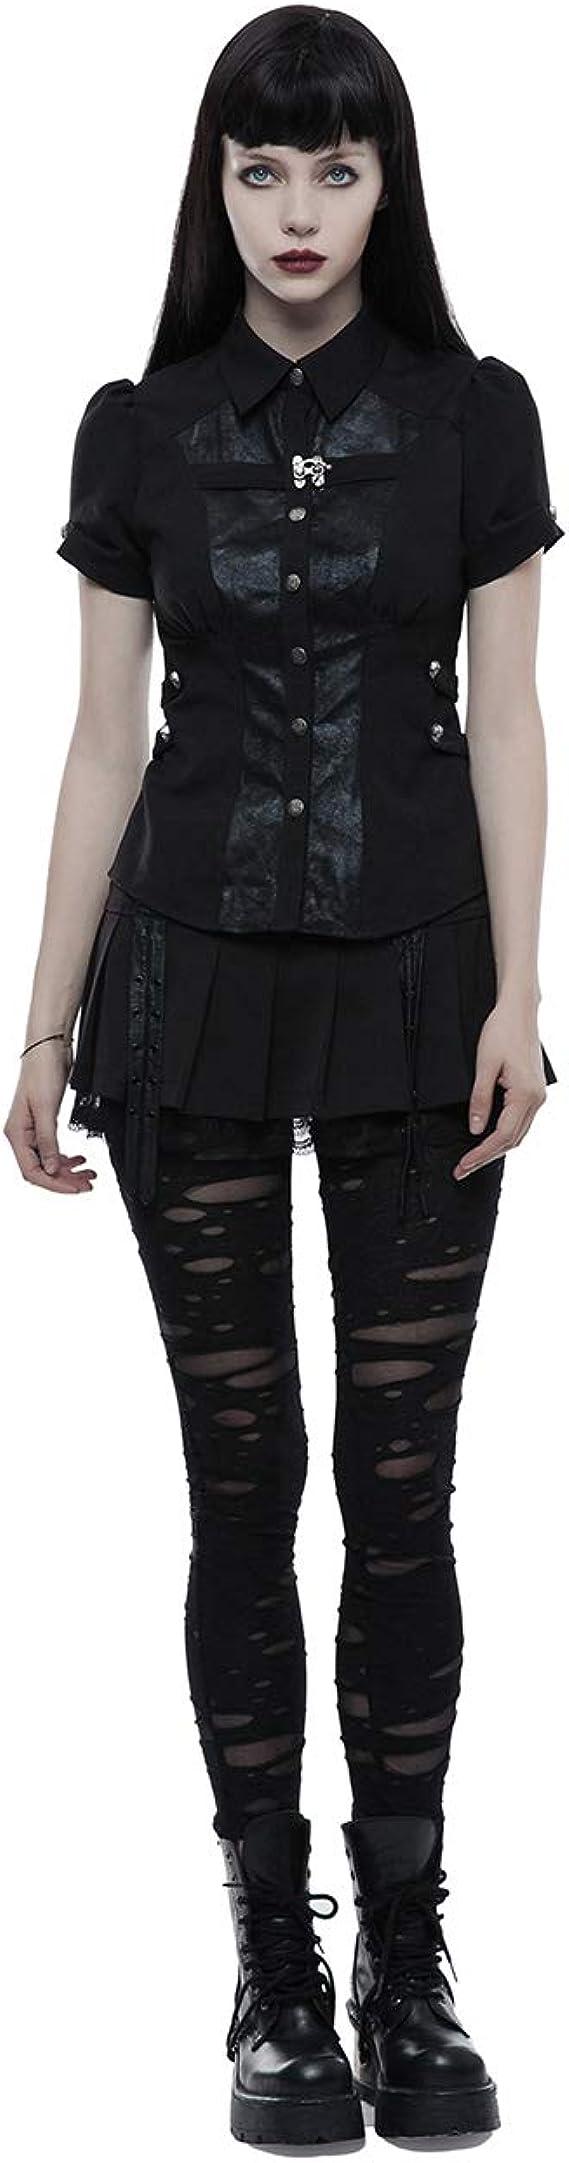 Gothic Steampunk Punk Rave Top Shirt Bluse Spitze 38 40 42 44